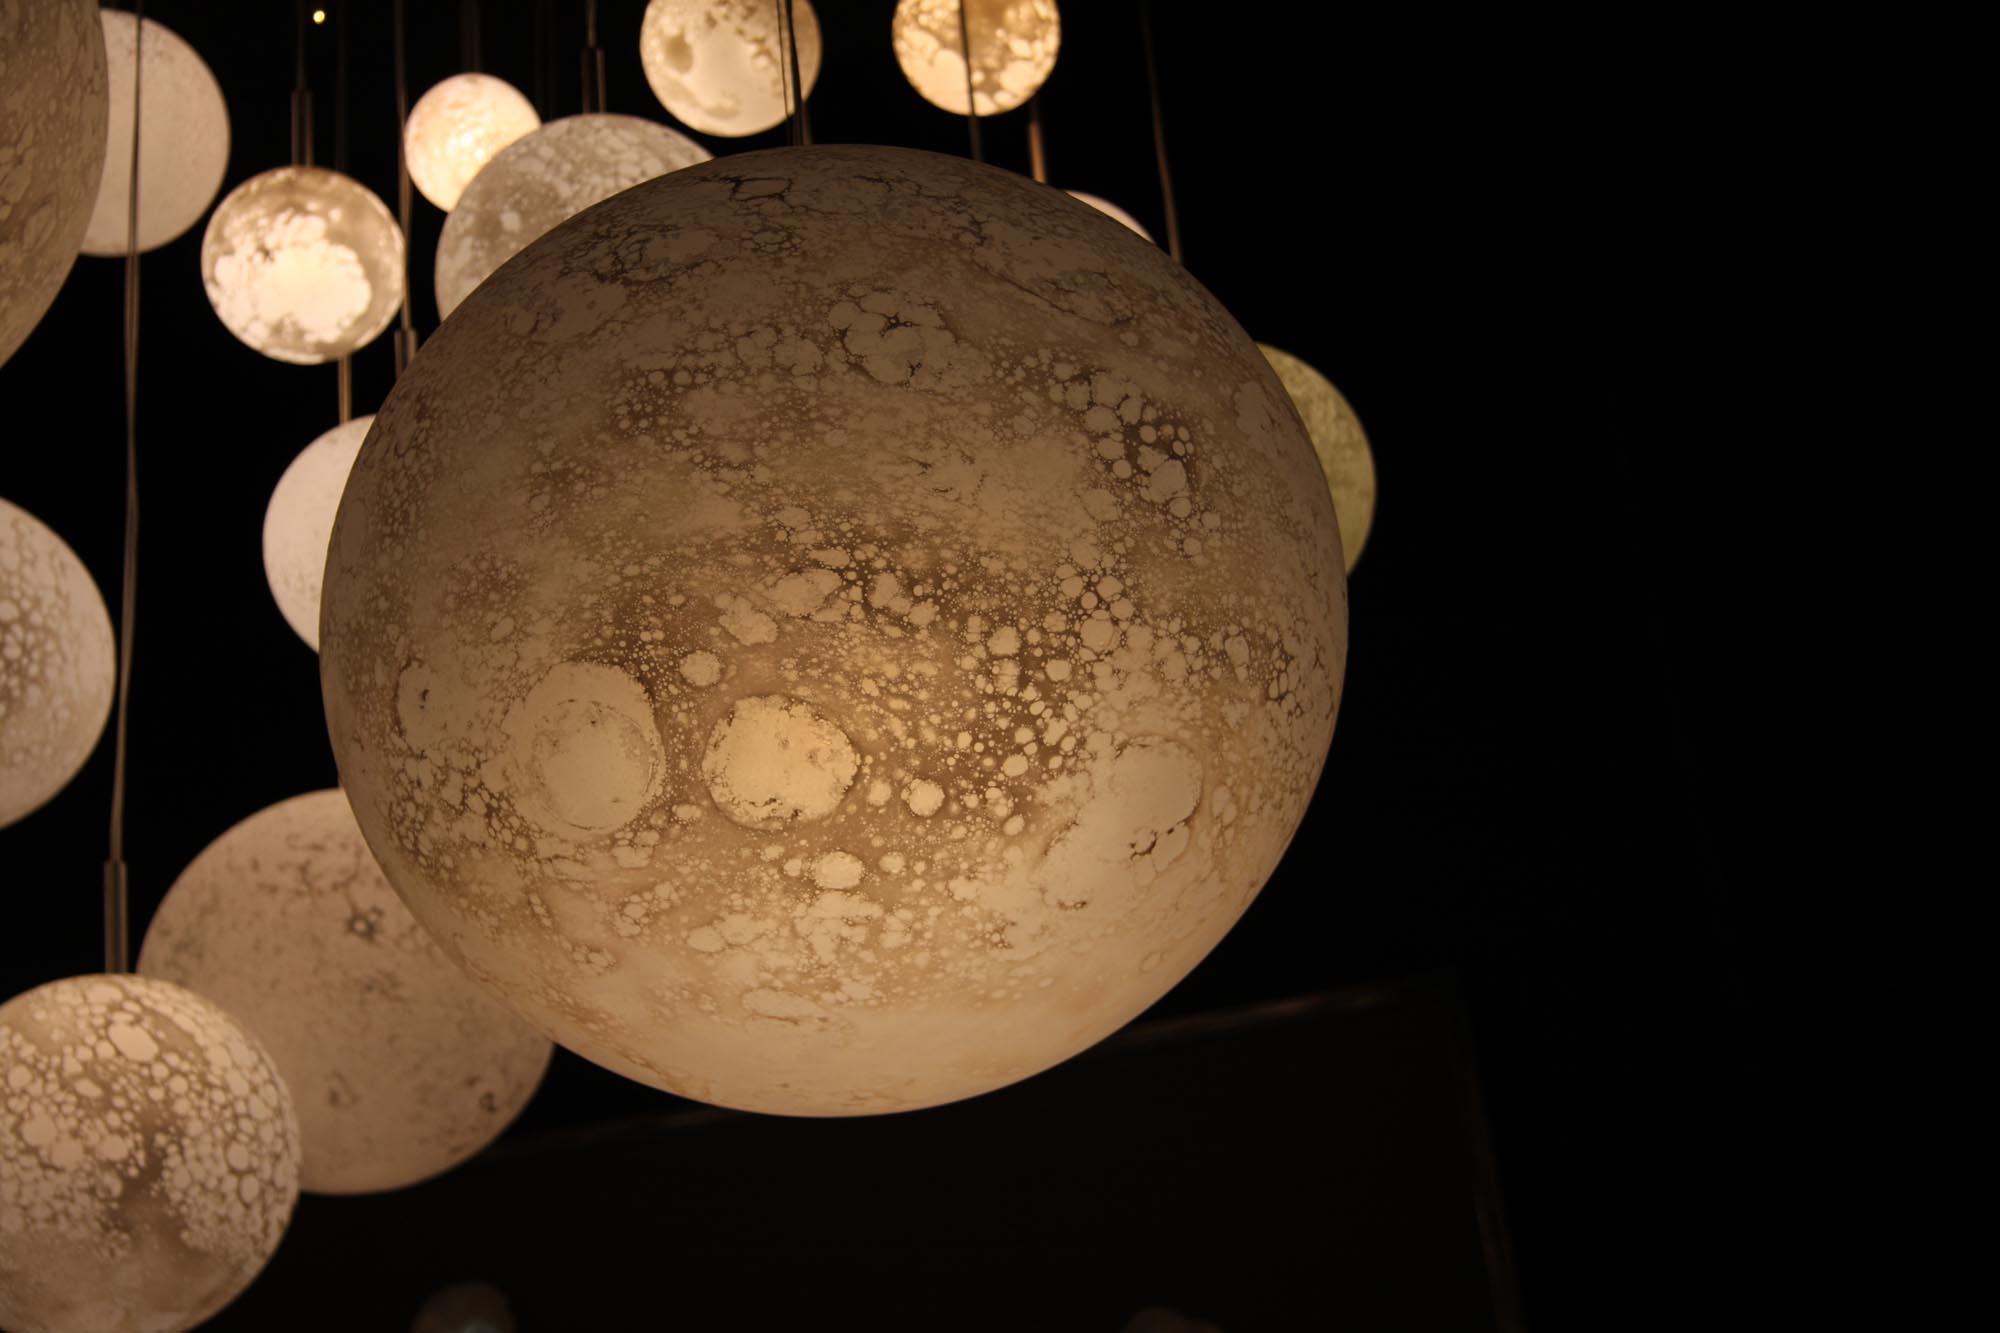 Planètes hanging lights, foreground: diam. 42cm